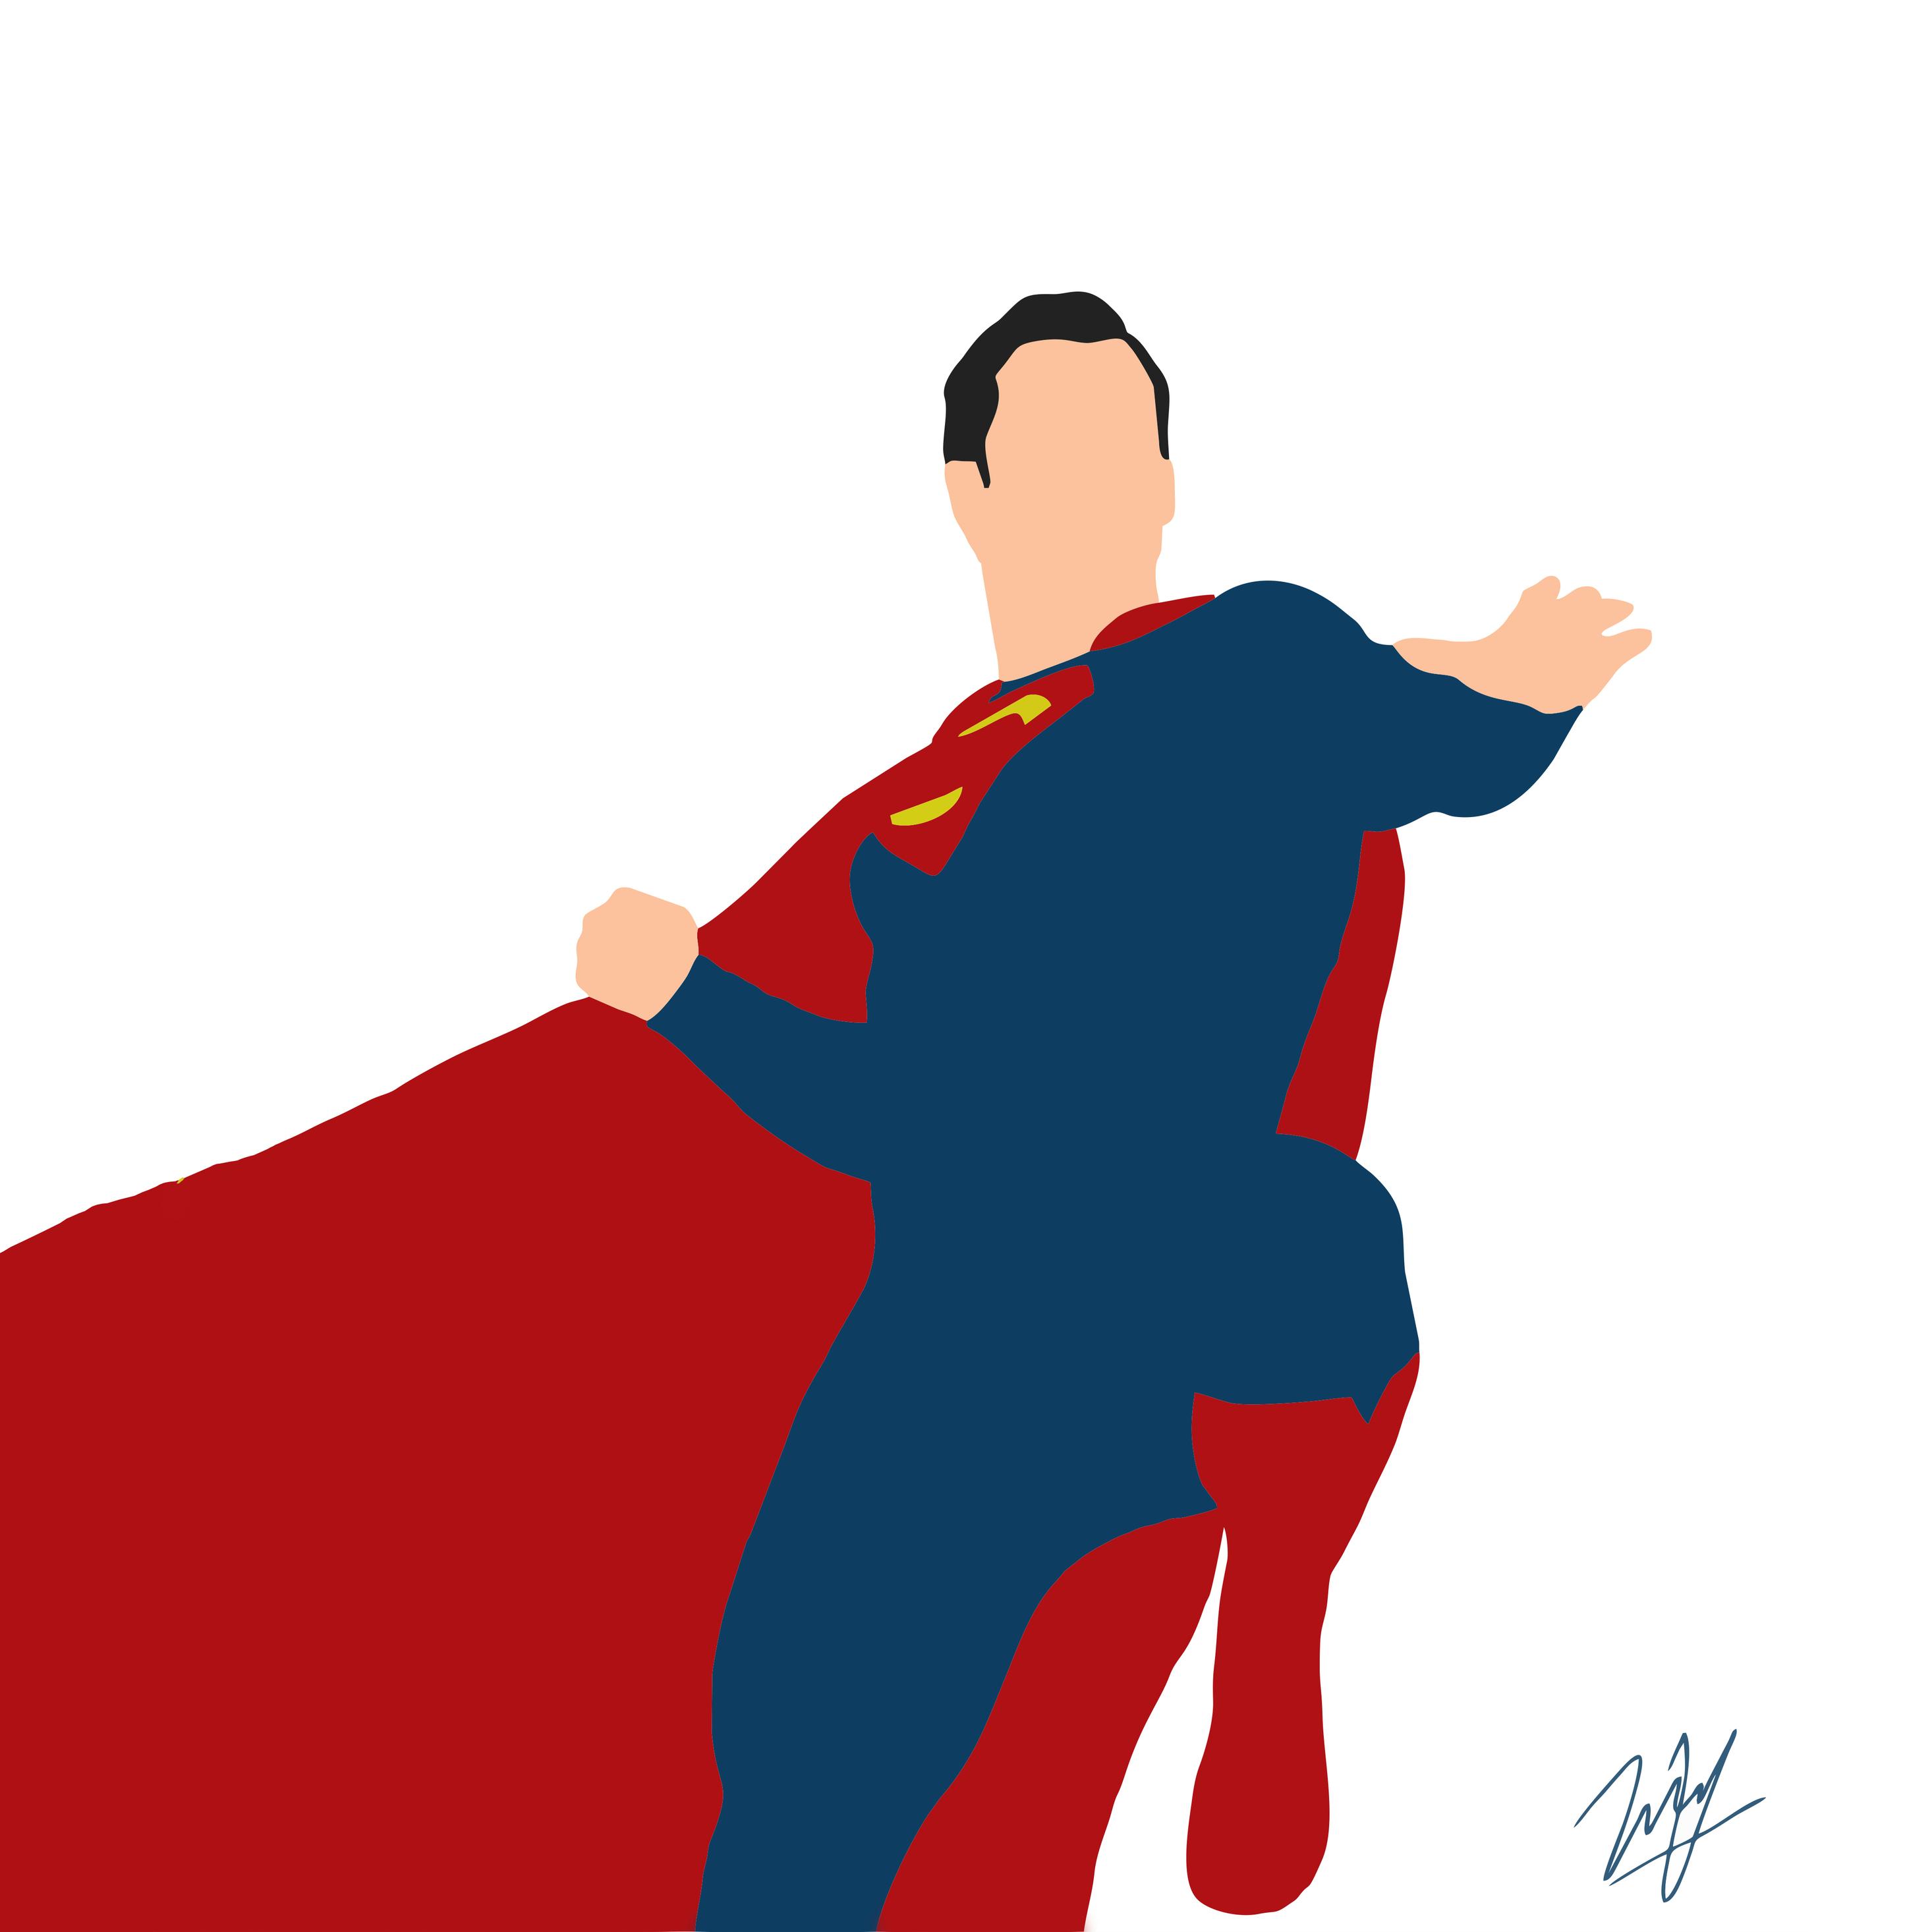 superman-justice-league-minimalism-j6.jpg